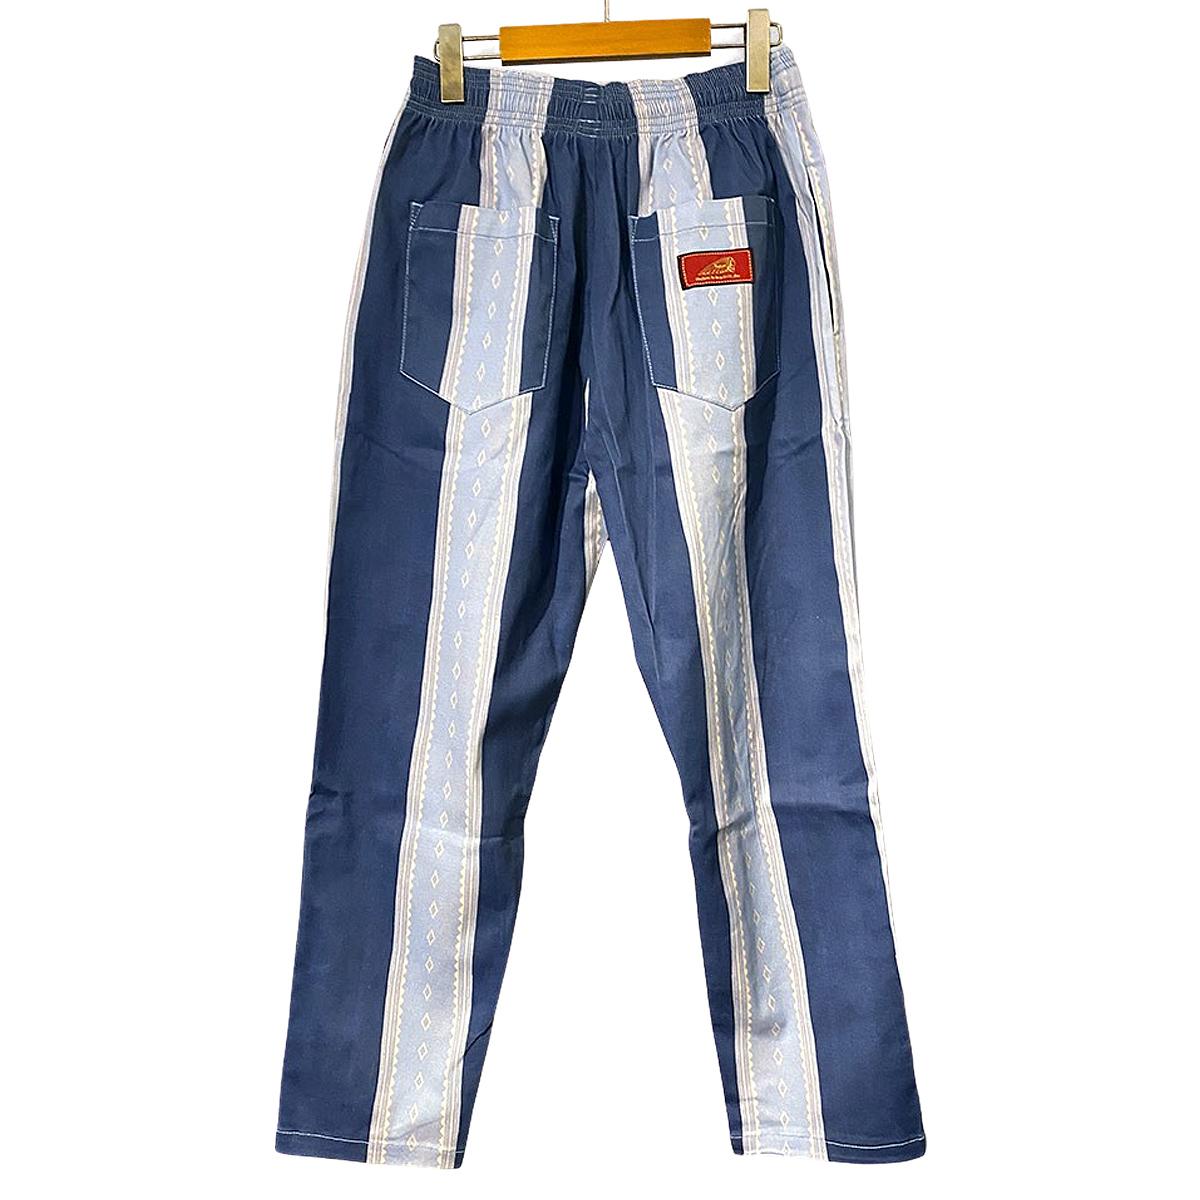 Indian インディアン Garage Pants ナバホストライプ